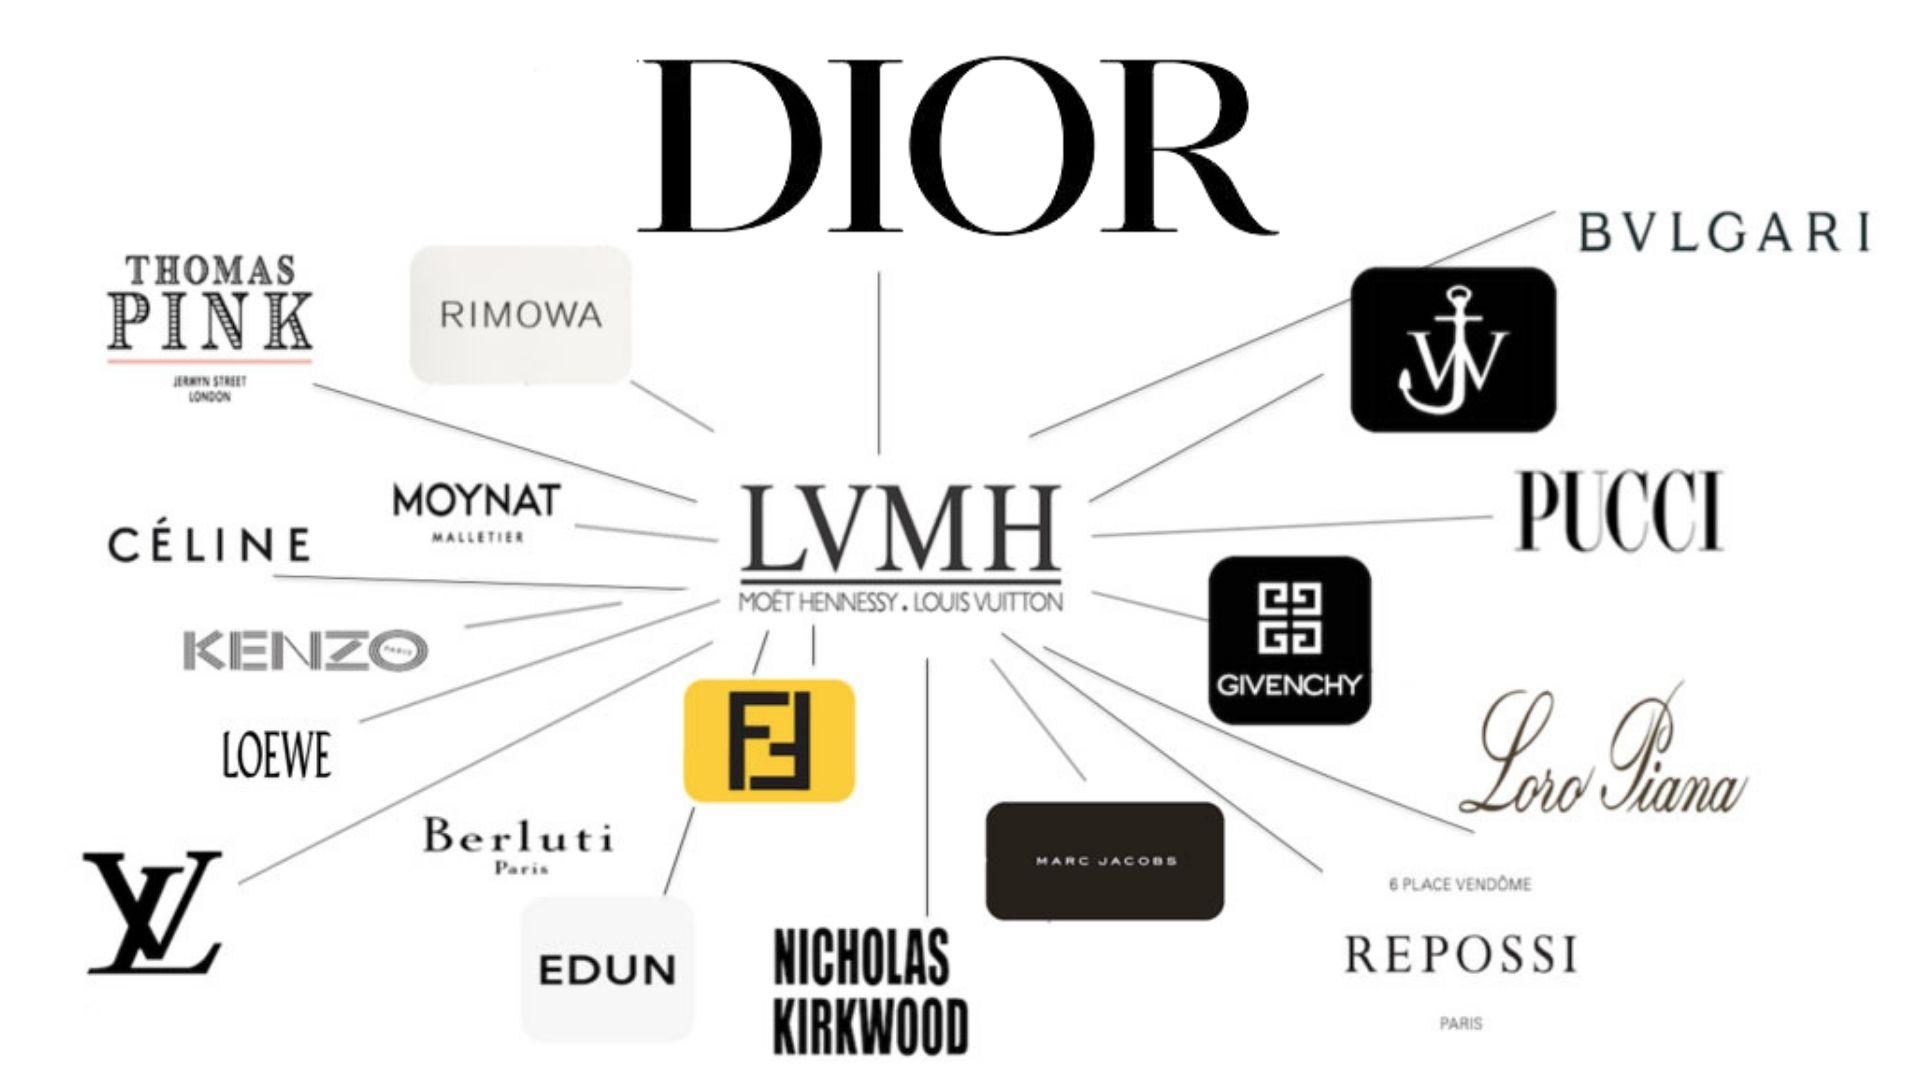 Dior LVMH